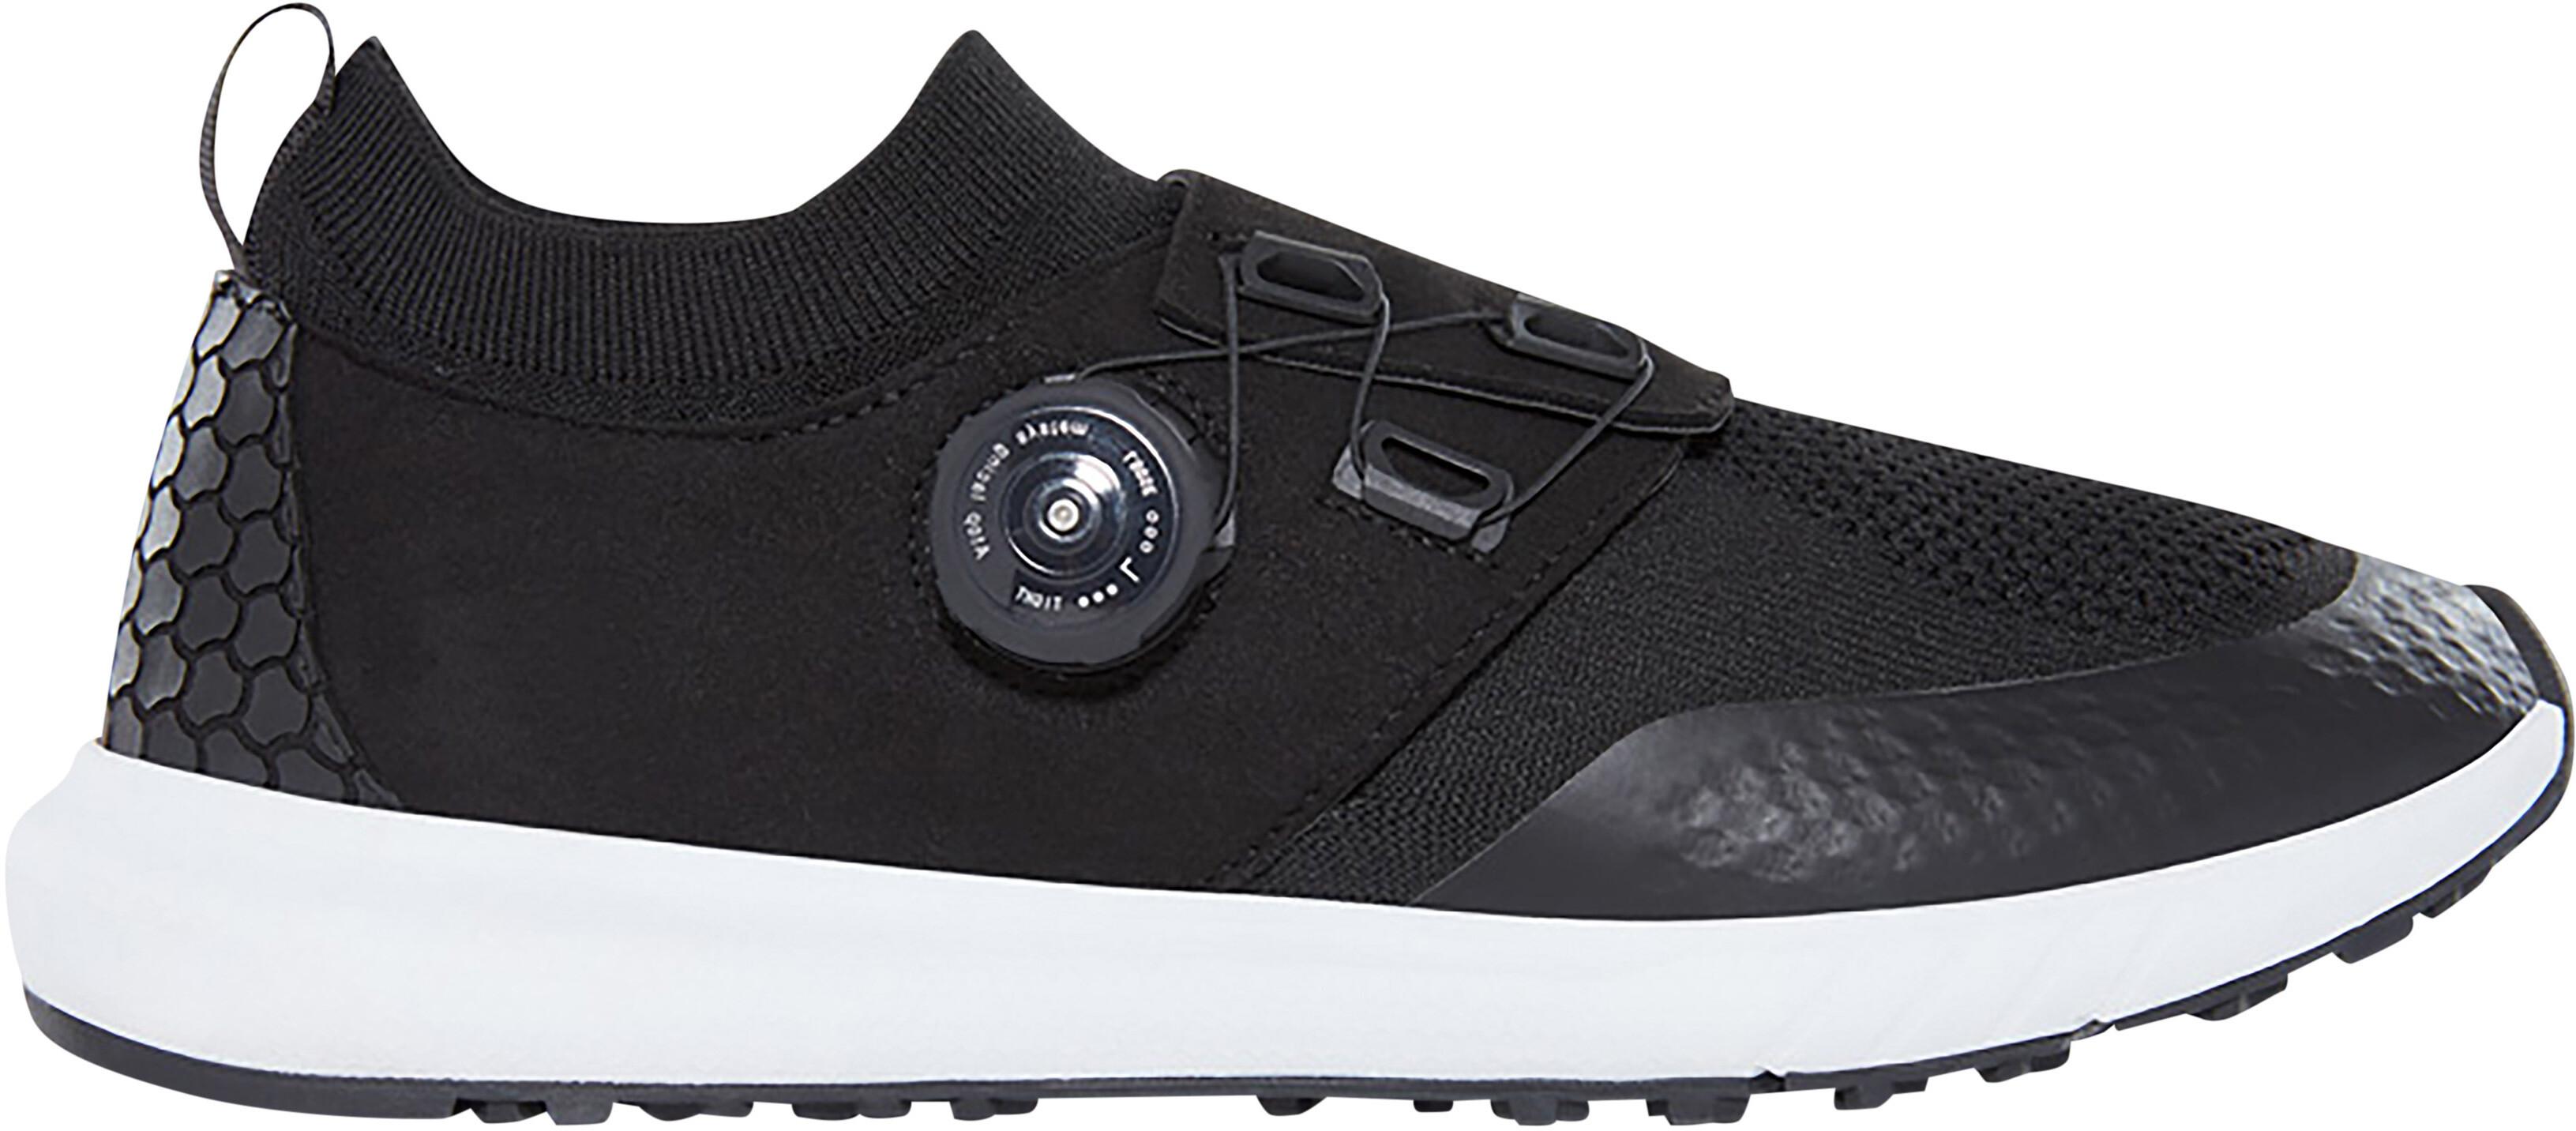 006978d475 The North Face Touji Boa - Chaussures Homme - noir sur CAMPZ !